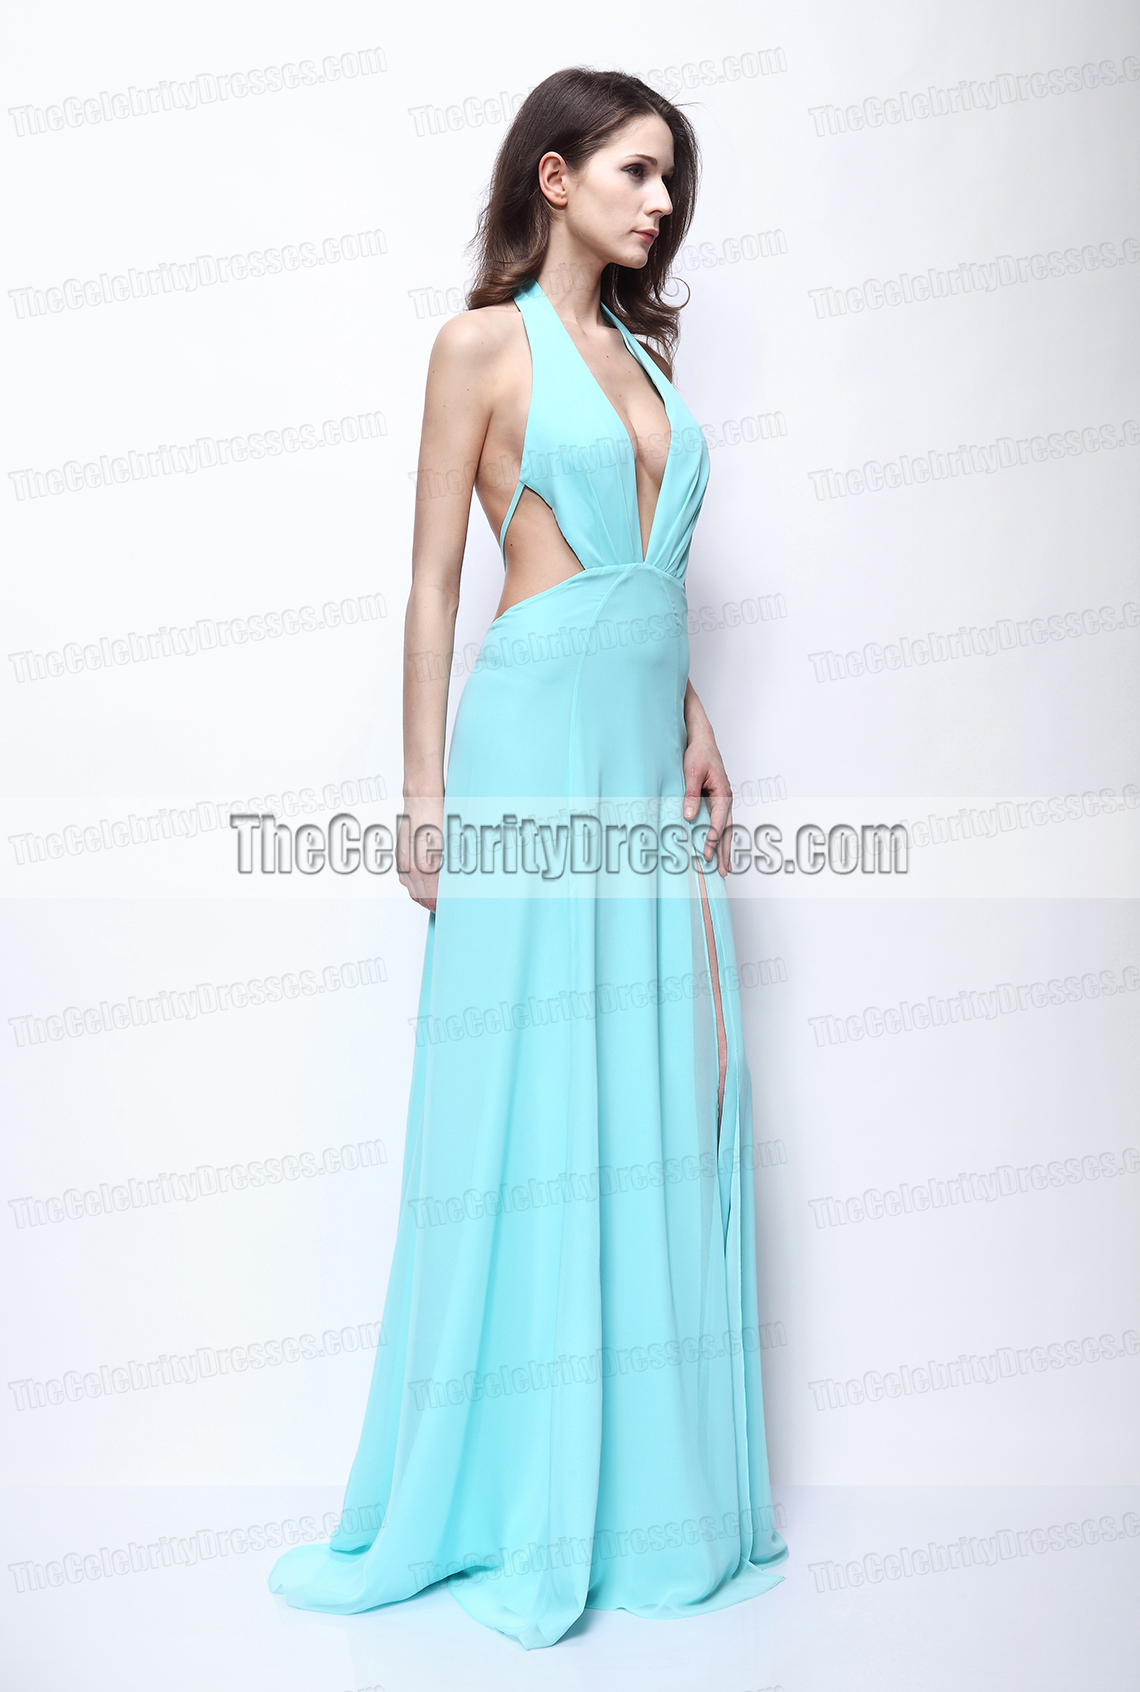 Kimberley Garner Sexy Backless Prom Dress \'The Dark Knight Rises ...